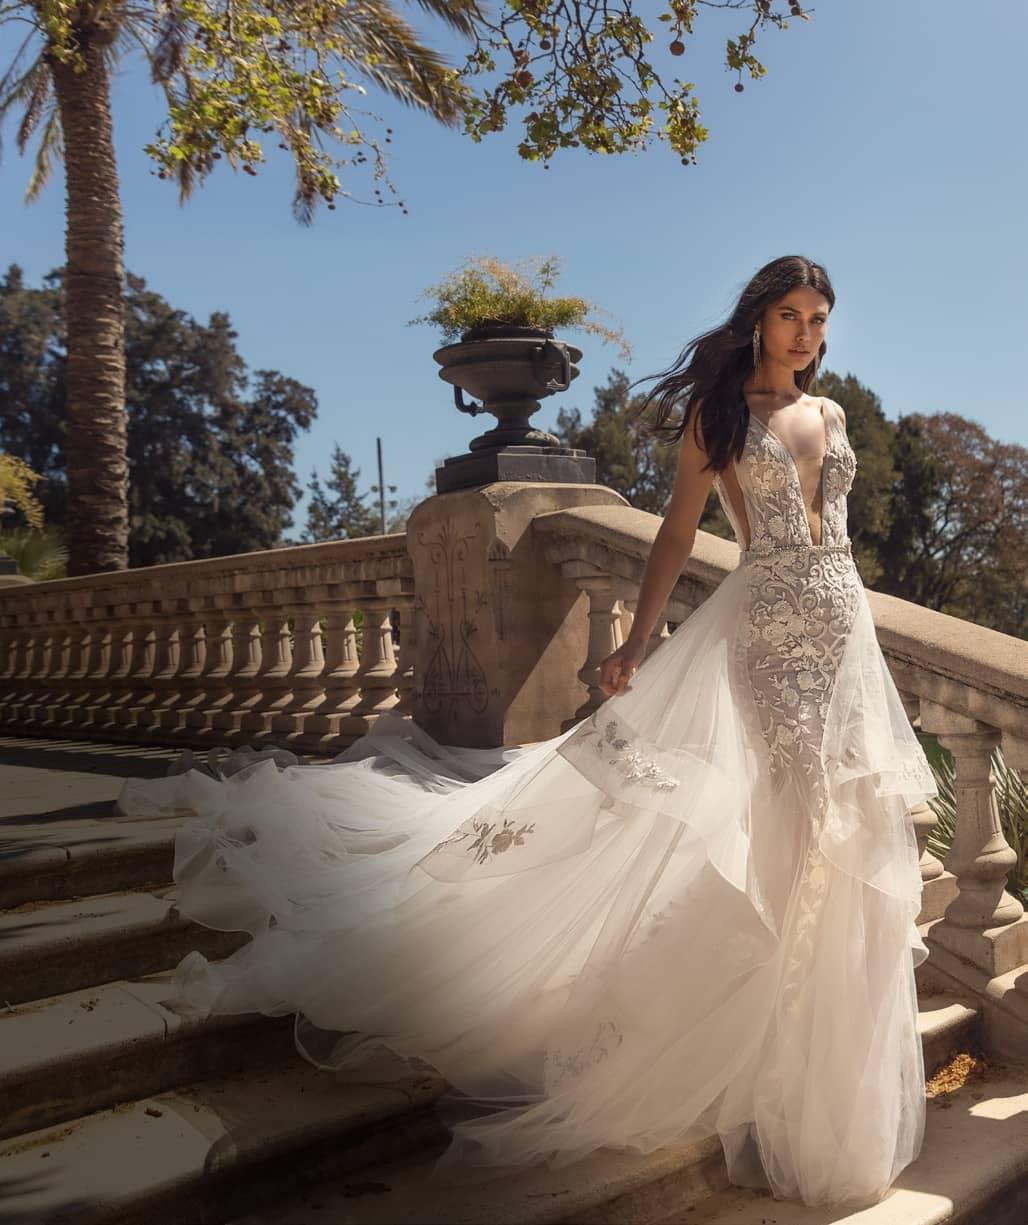 Barcelona 2020: The New Era Of Beautiful Bespoke Brides